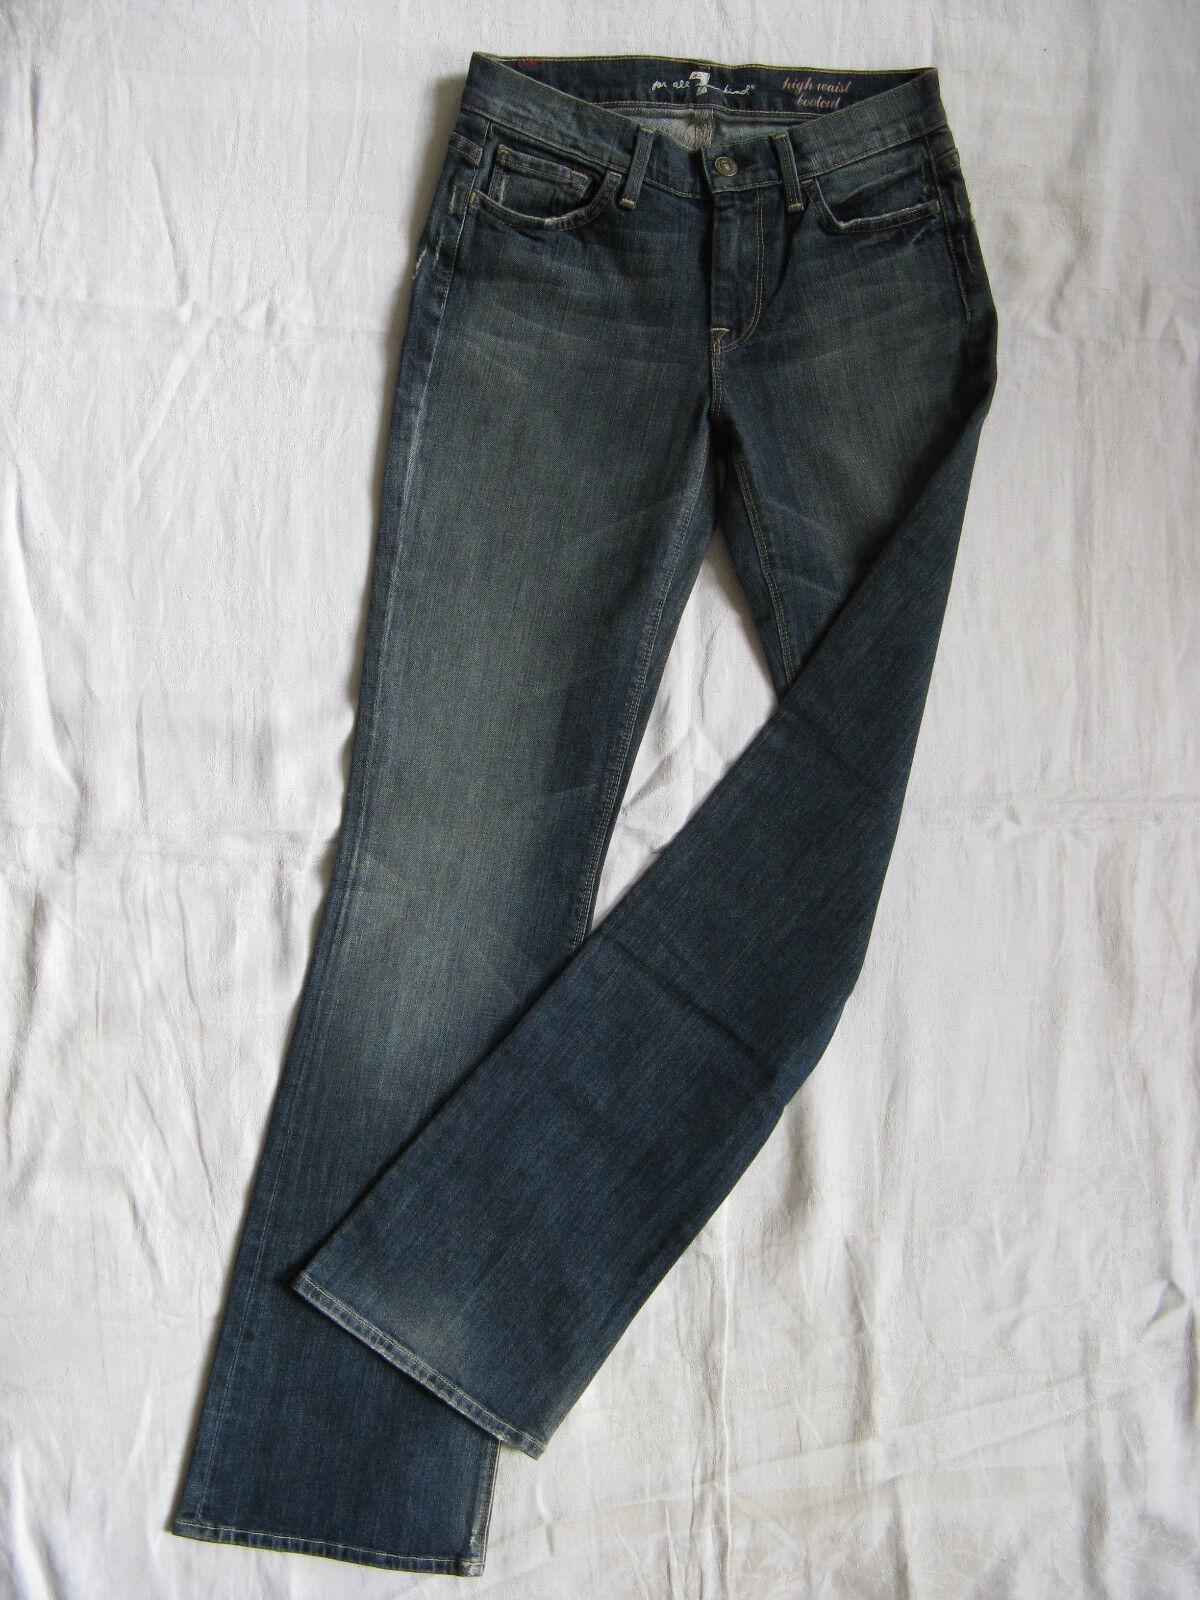 7 SEVEN FOR ALL MANKIND Donna blu Jeans Stretch w26 l32 High Waist avviocut